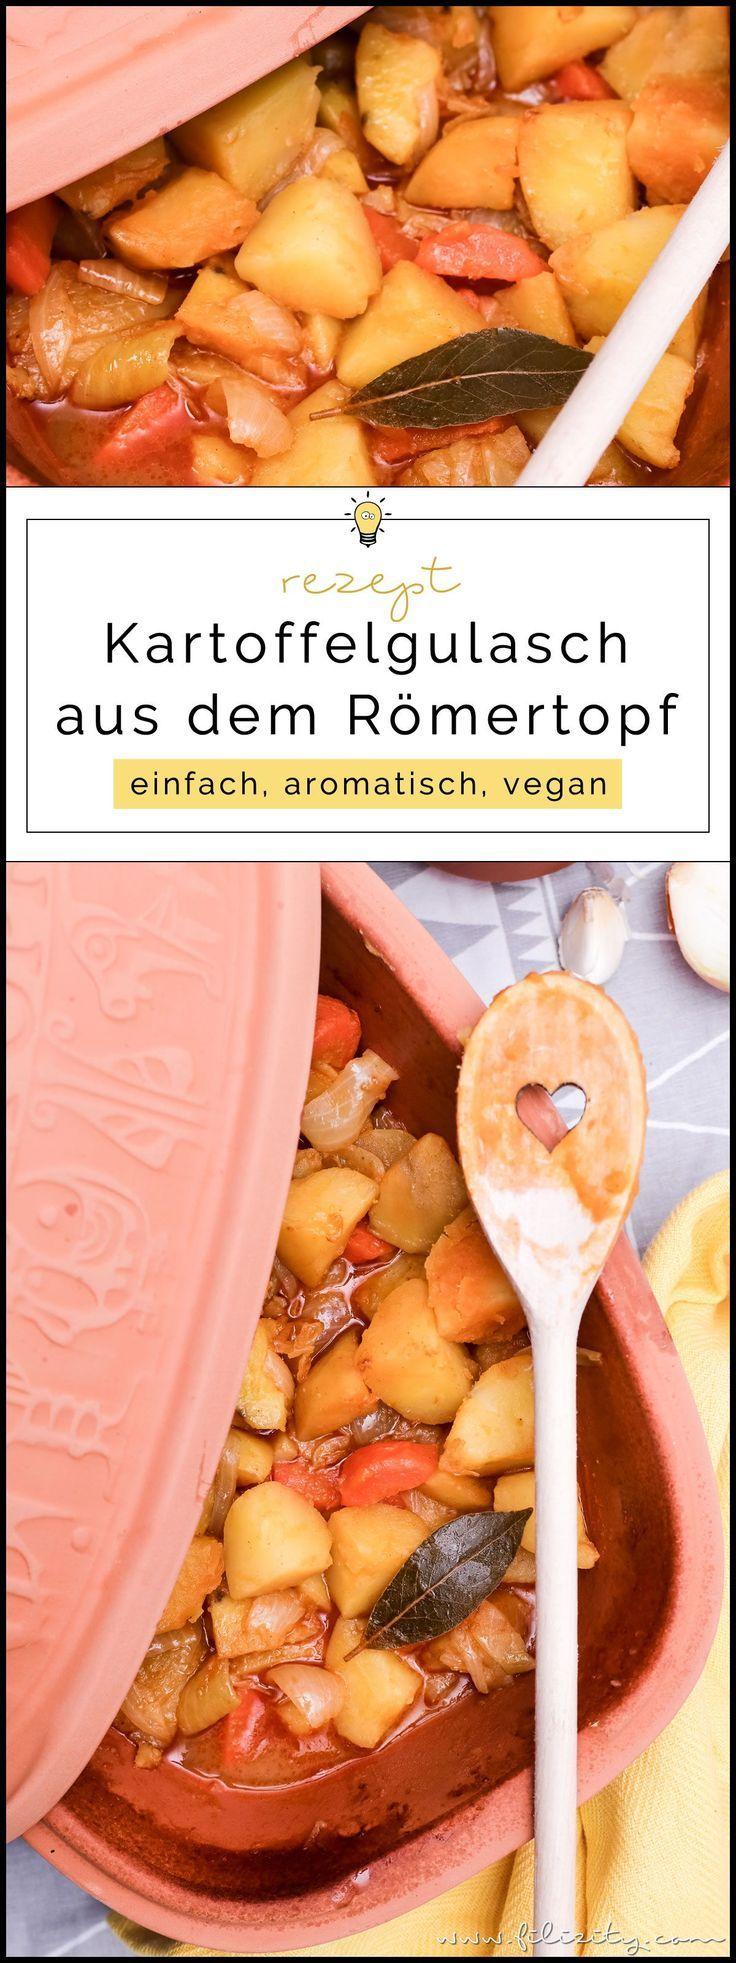 Kartoffelgulasch aus dem Römertopf #steakfajitarecipe